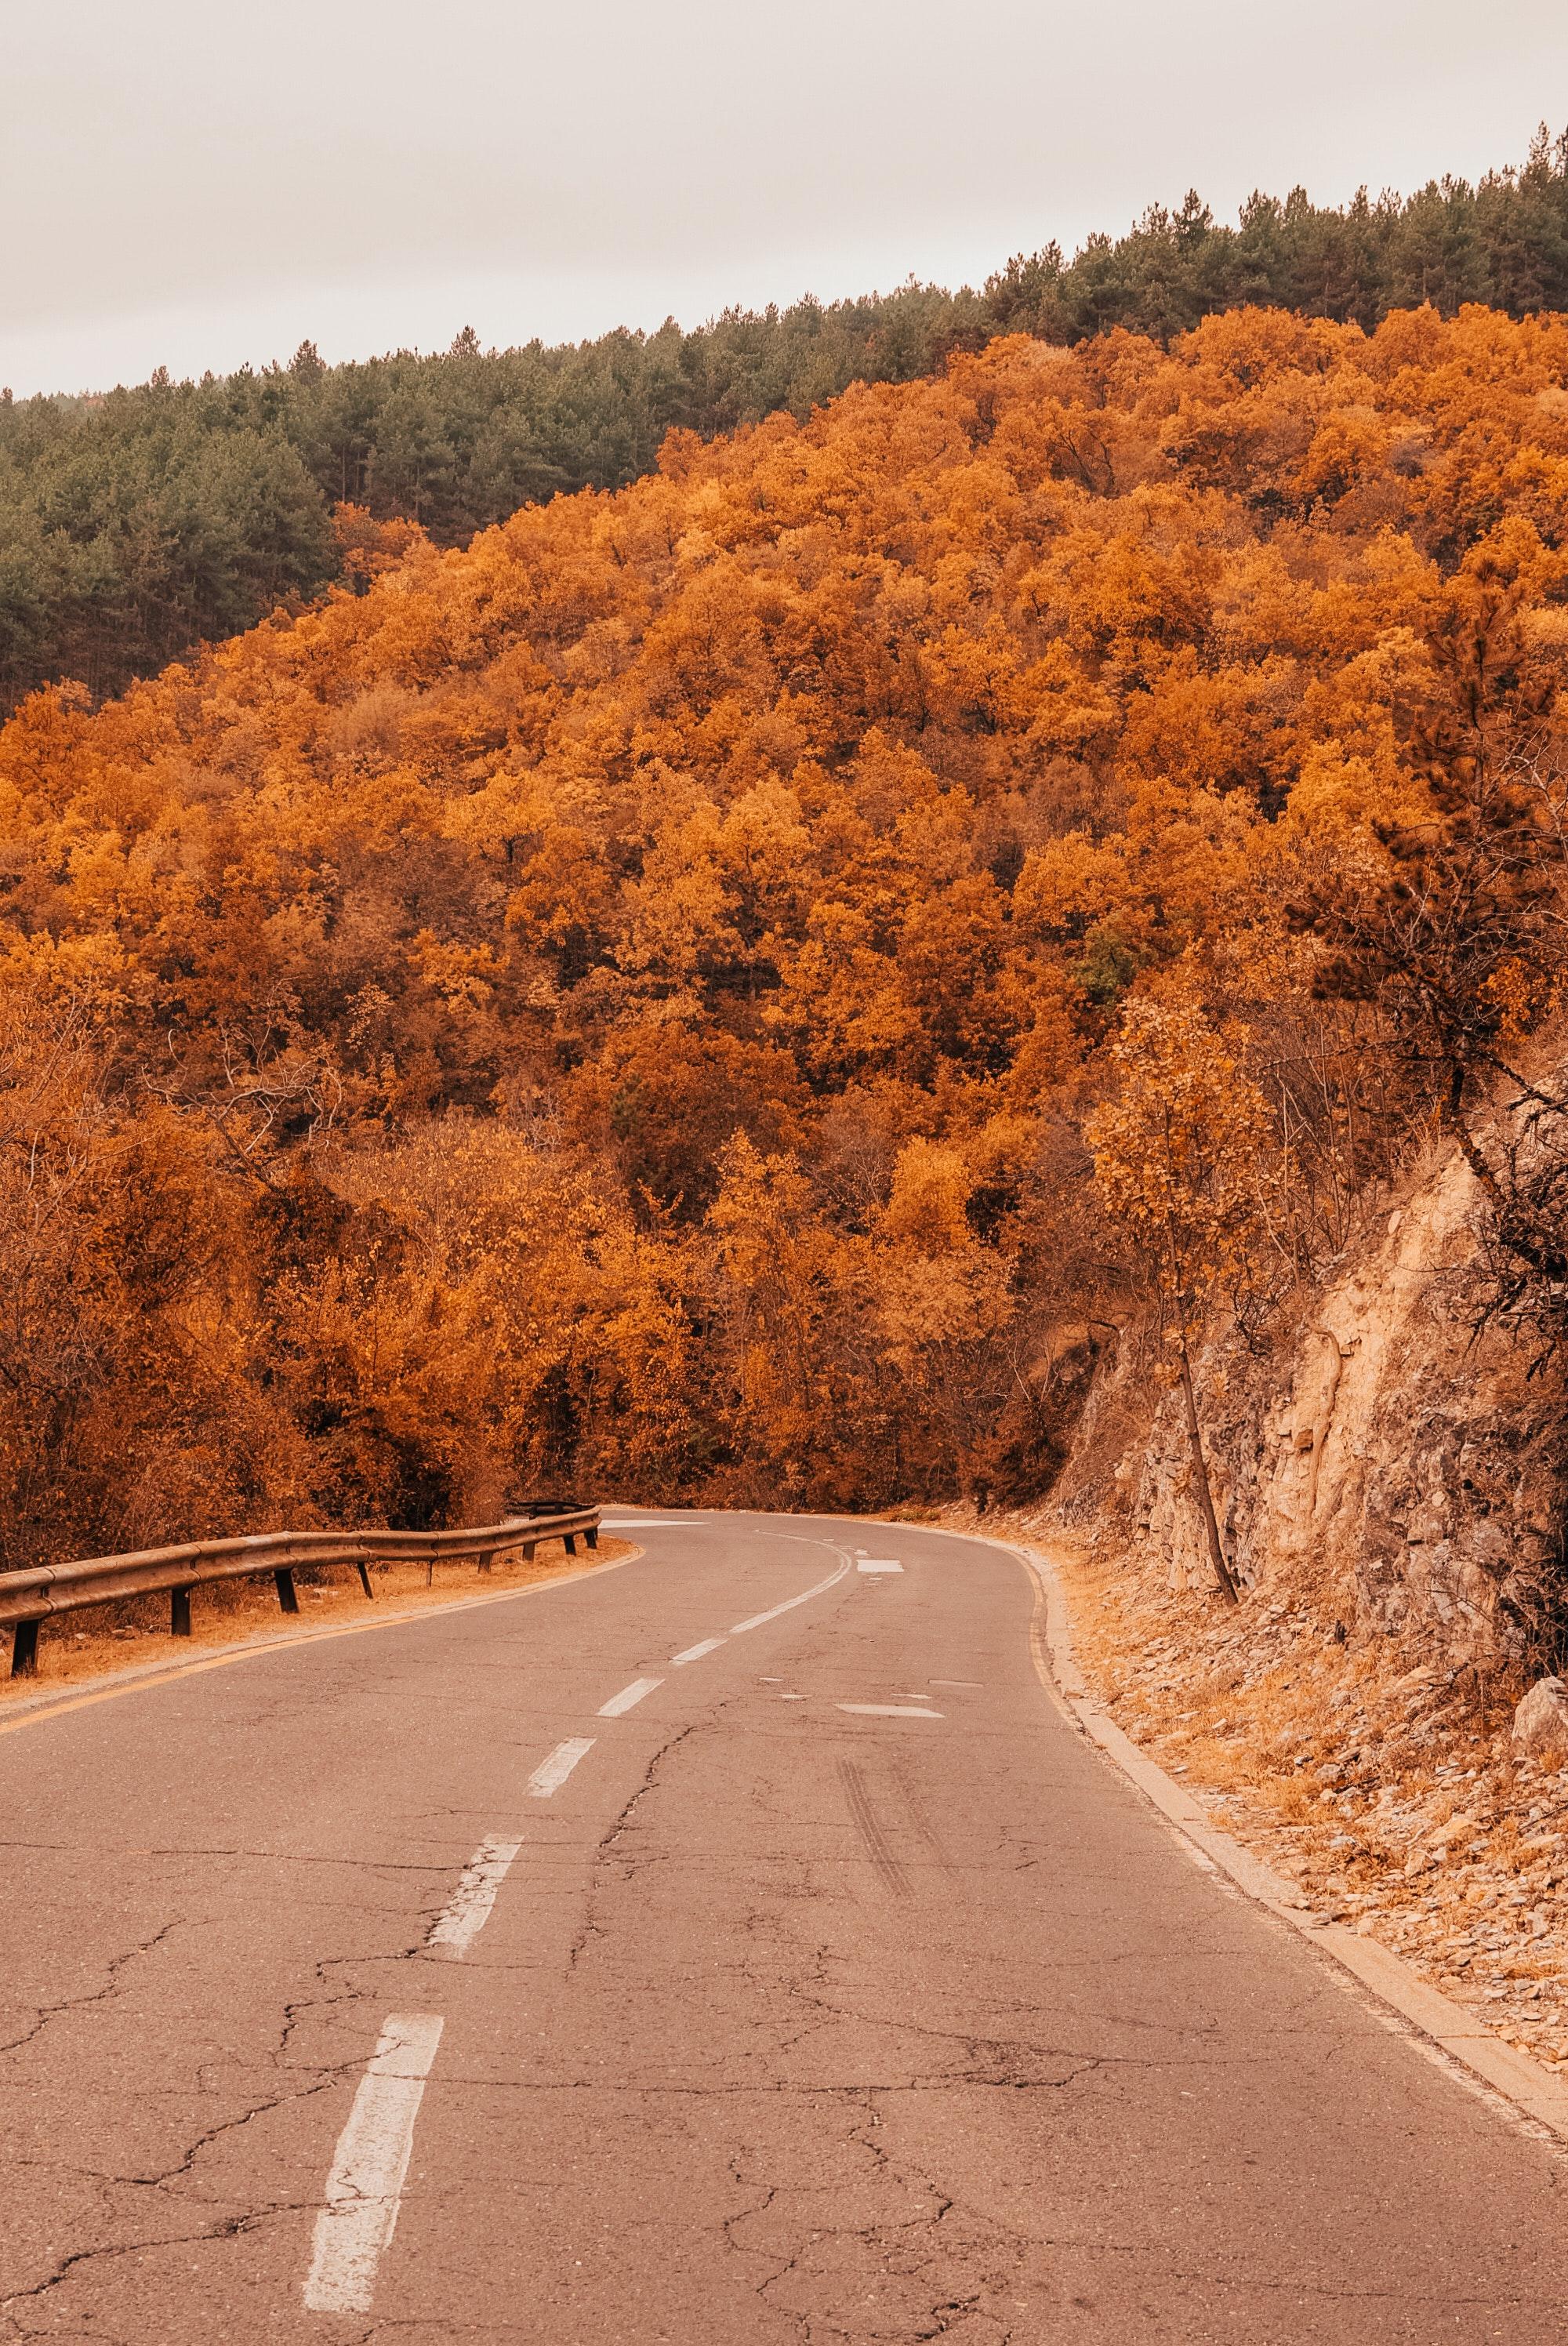 Asphalt road along the autumn forest on a hill